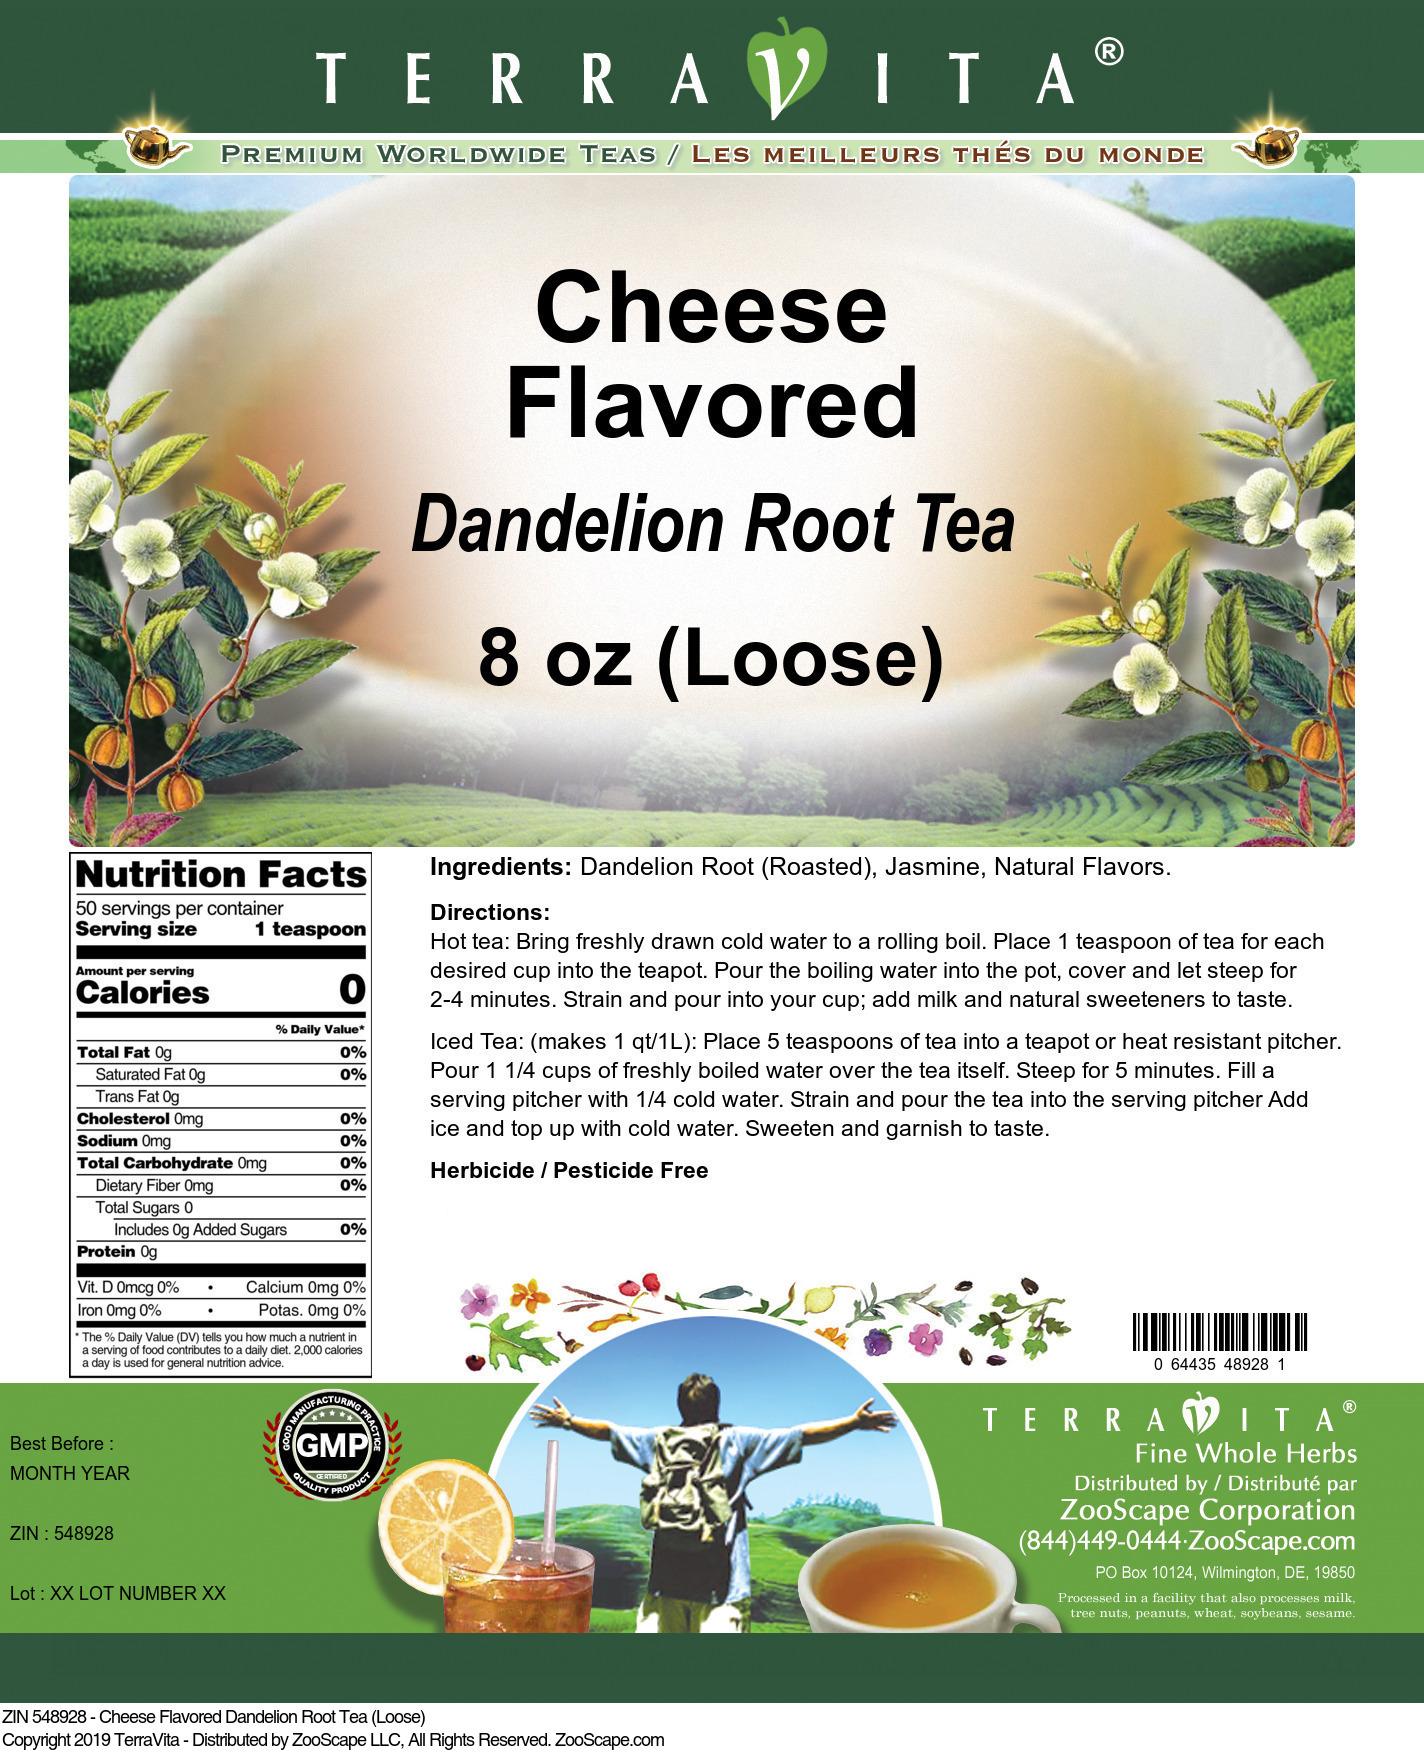 Cheese Flavored Dandelion Root Tea (Loose)